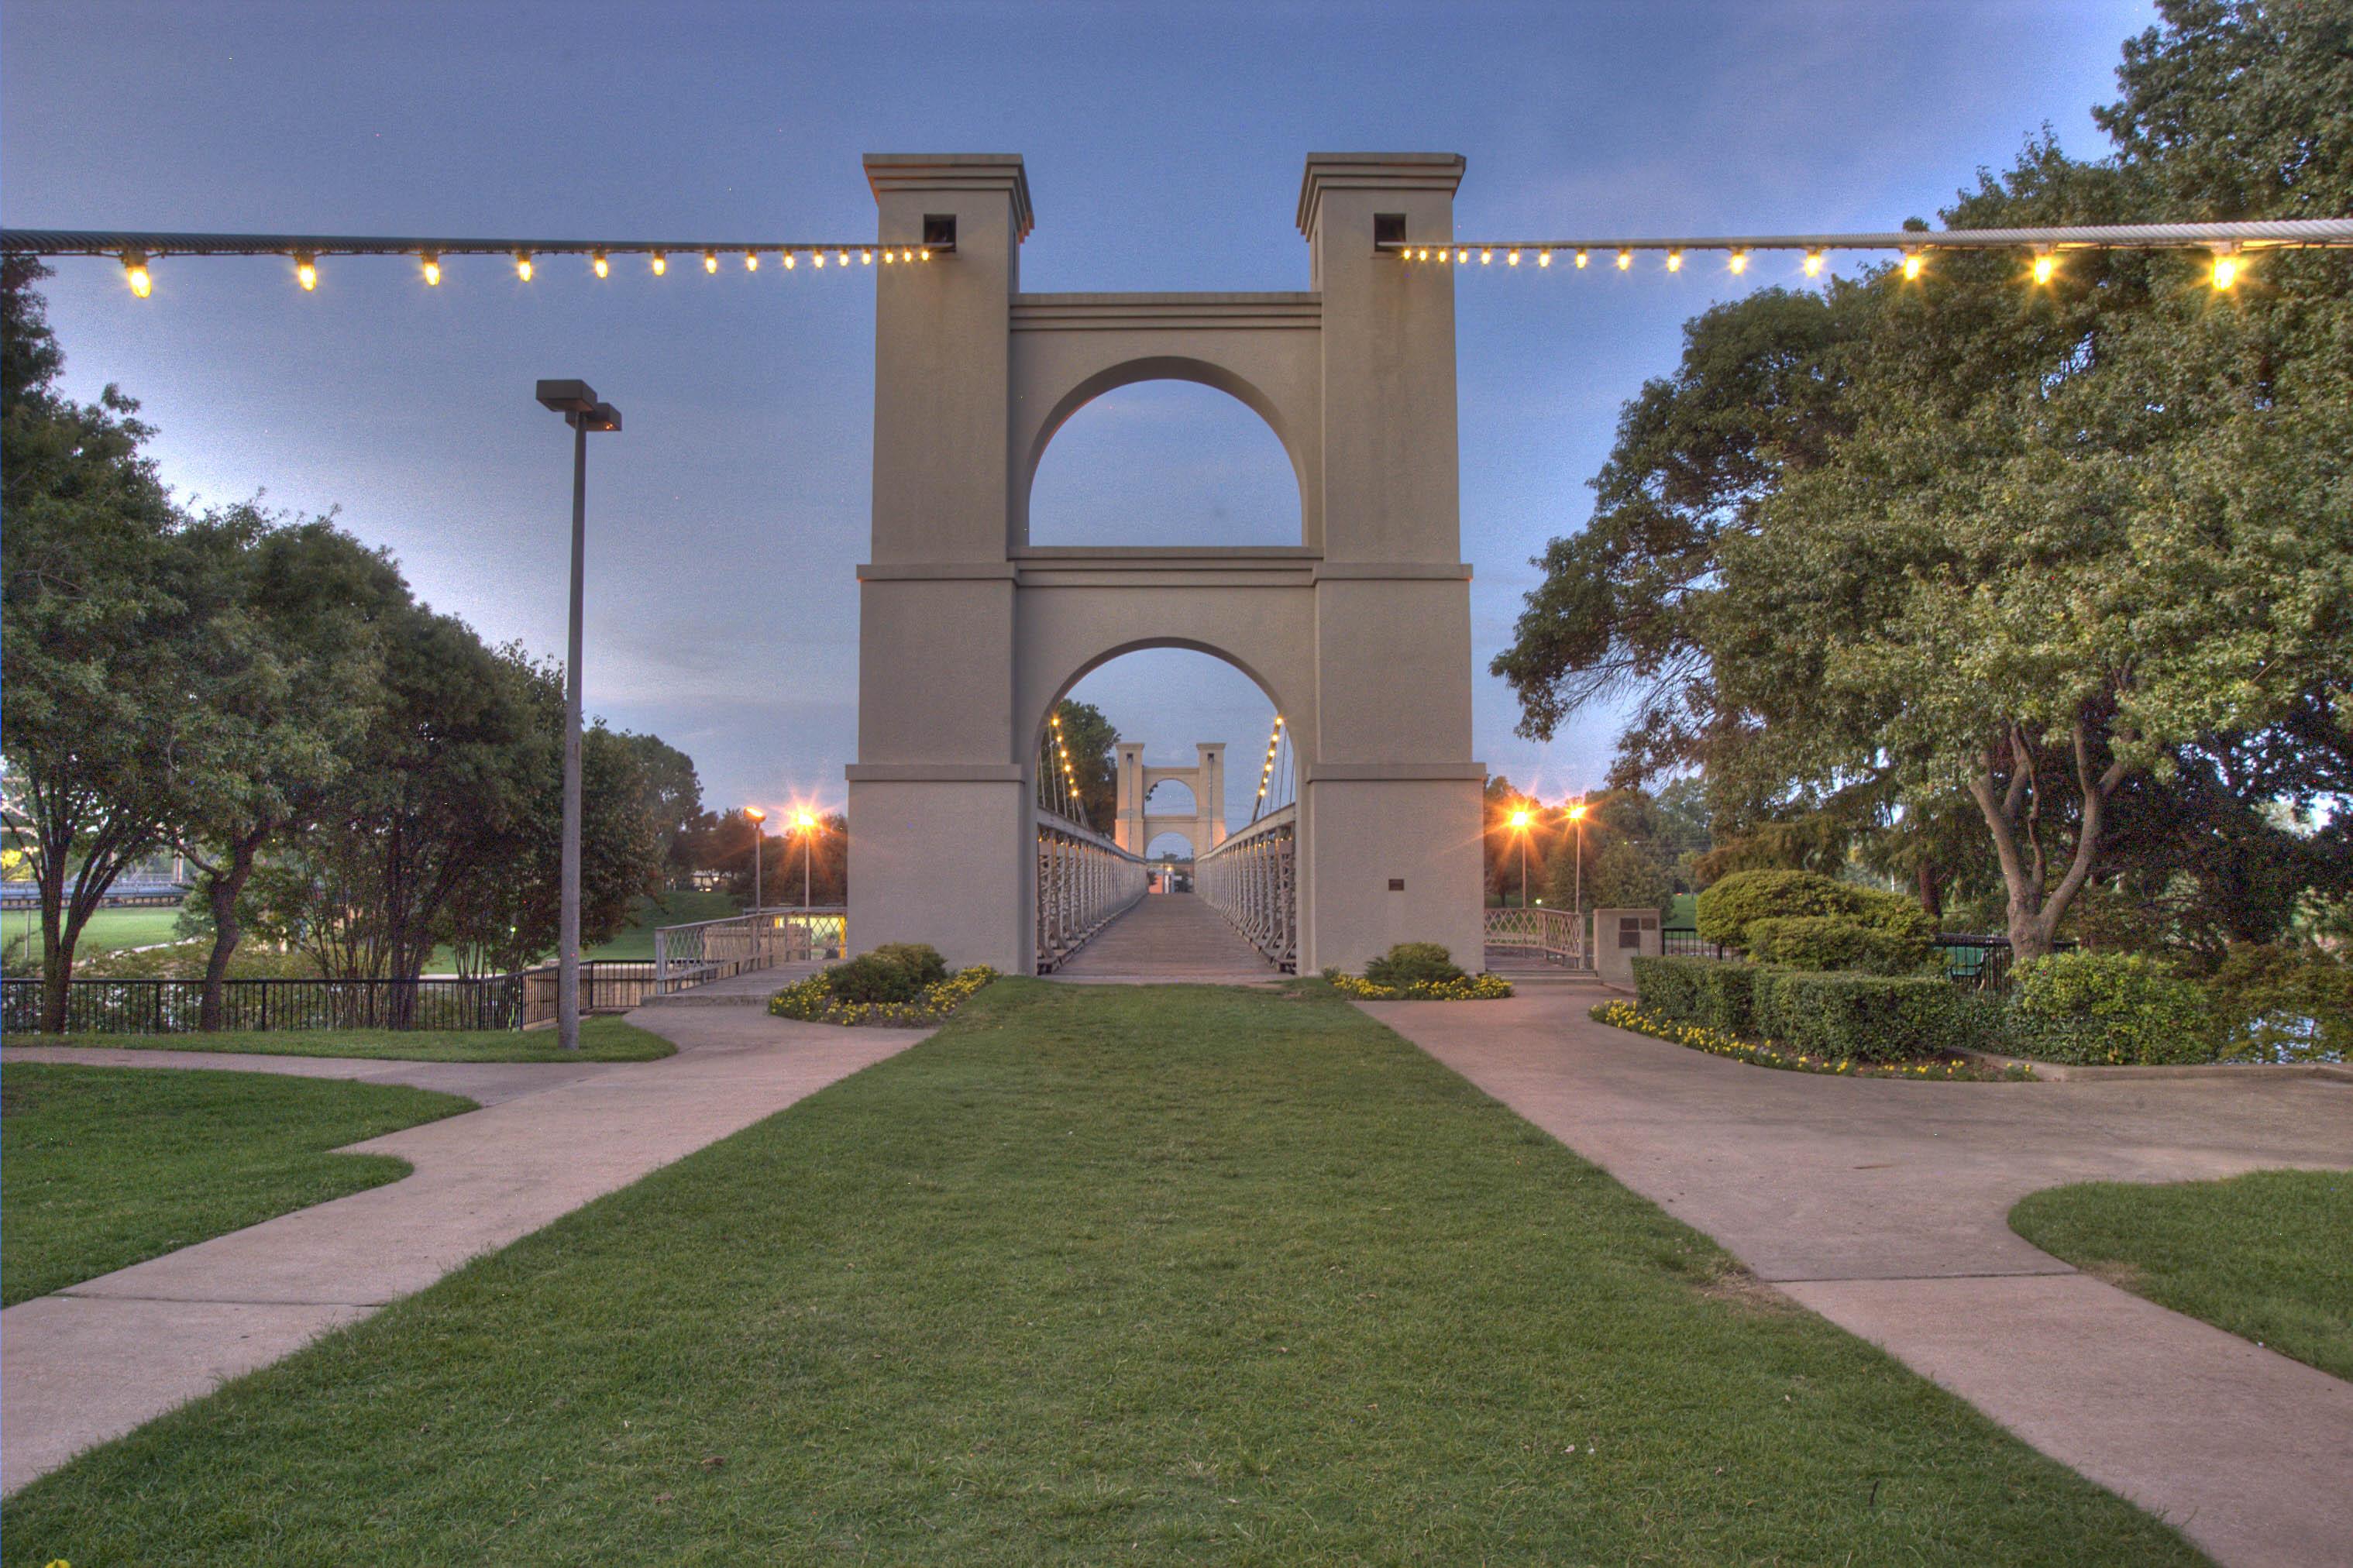 Photo 666 26 Waco Suspension Bridge South West Entrance